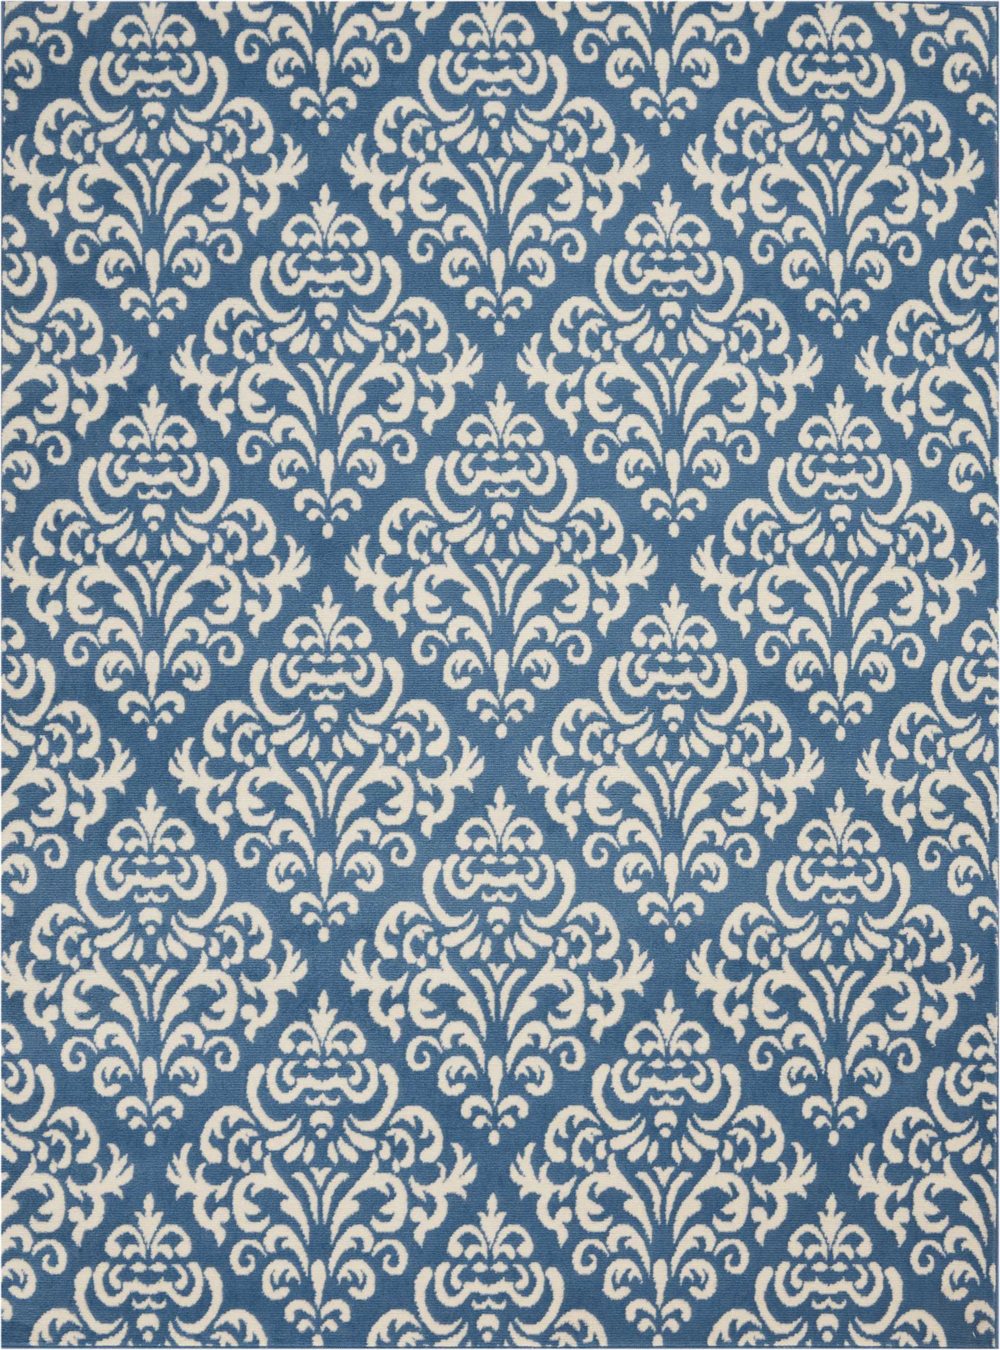 Nourison GRAFIX GRF06 BLUE Rug